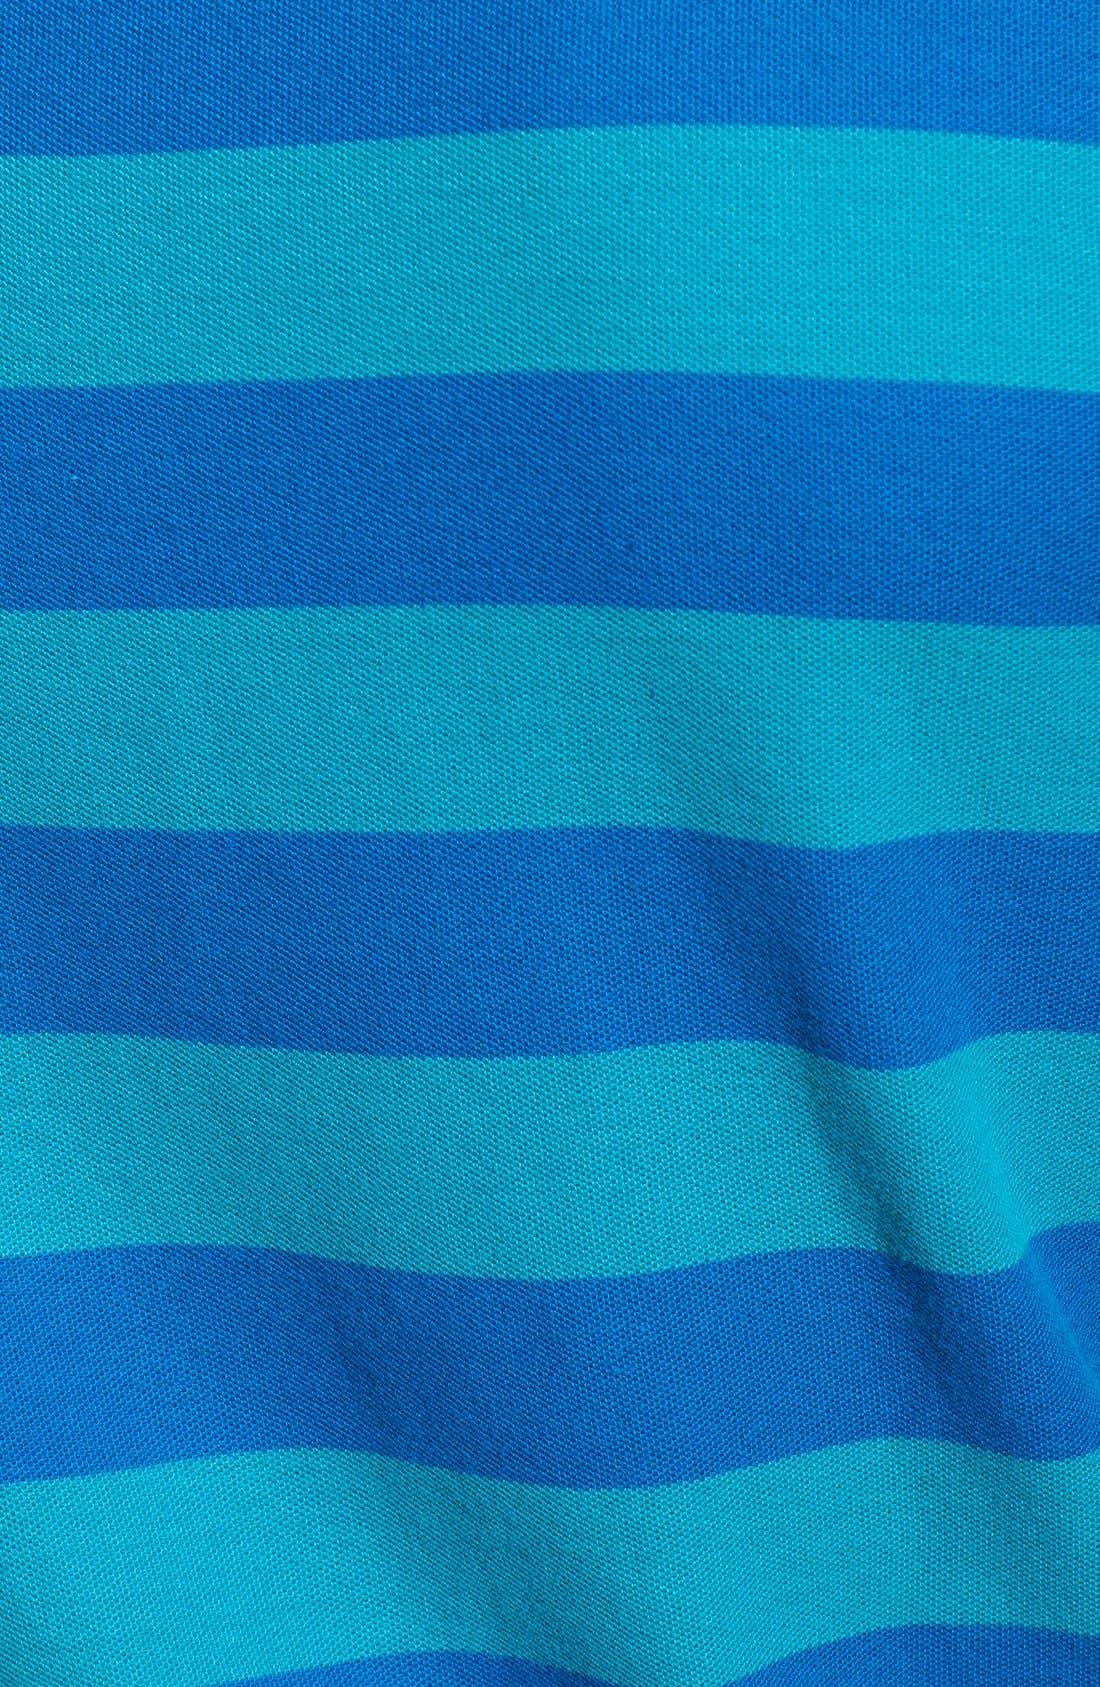 Two-Tone Stripe Piqué Polo,                             Alternate thumbnail 3, color,                             Biscay Bay